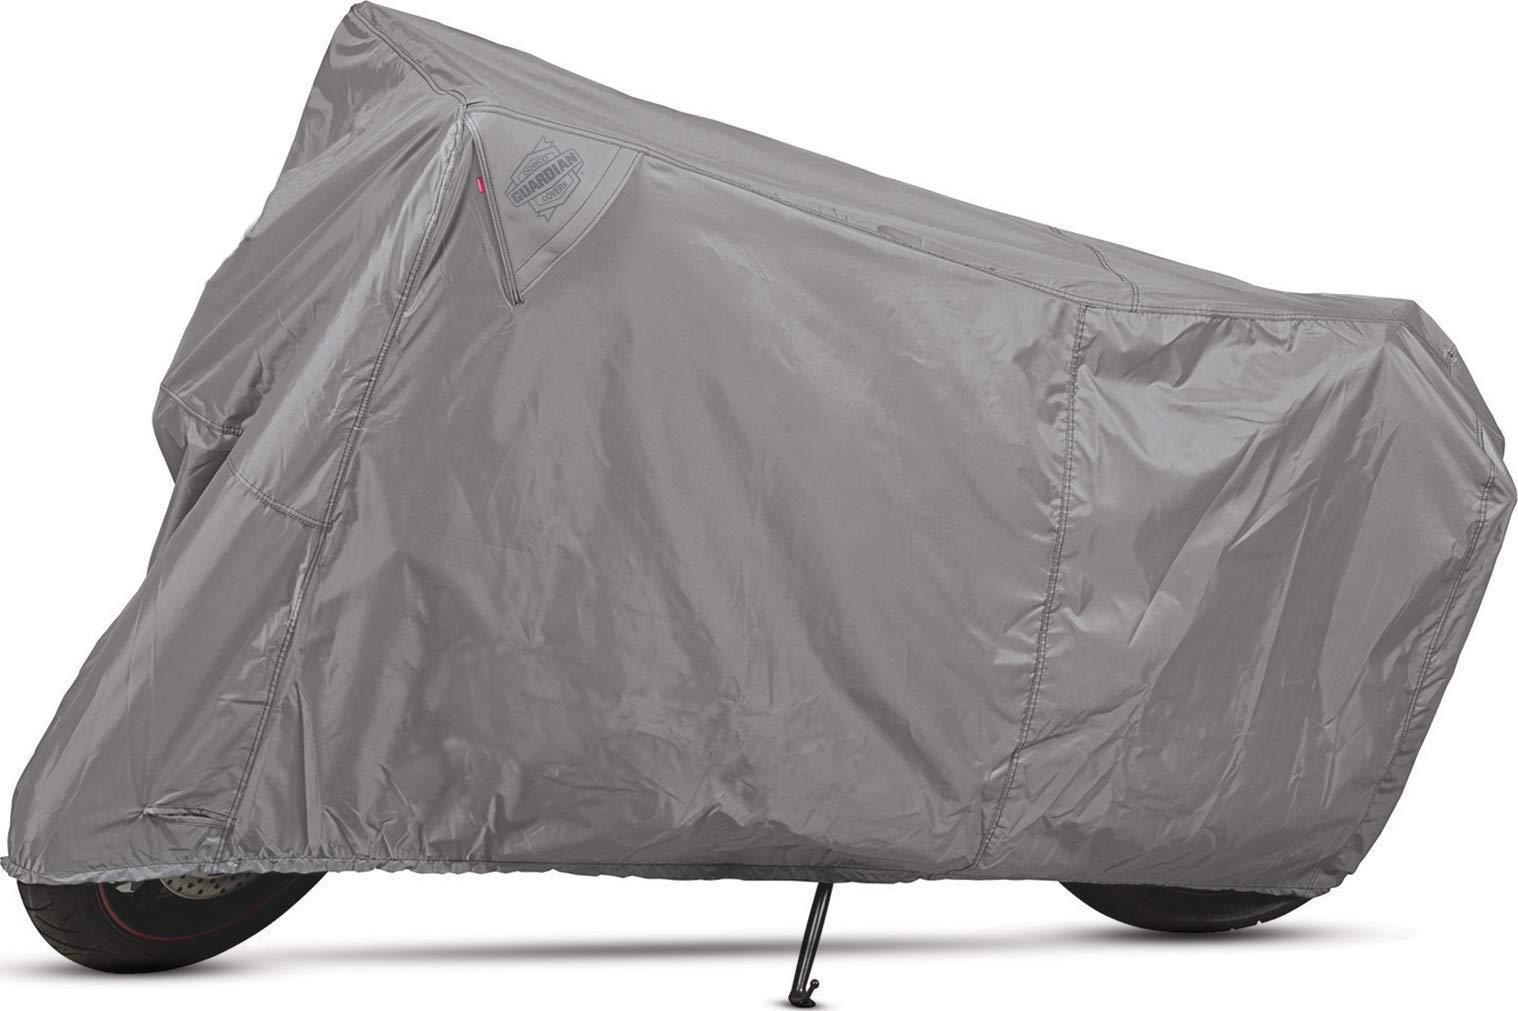 Dowco Guardian 50124-07 WeatherAll Plus Indoor/Outdoor Waterproof Motorcycle Cover: Grey, Sportbike